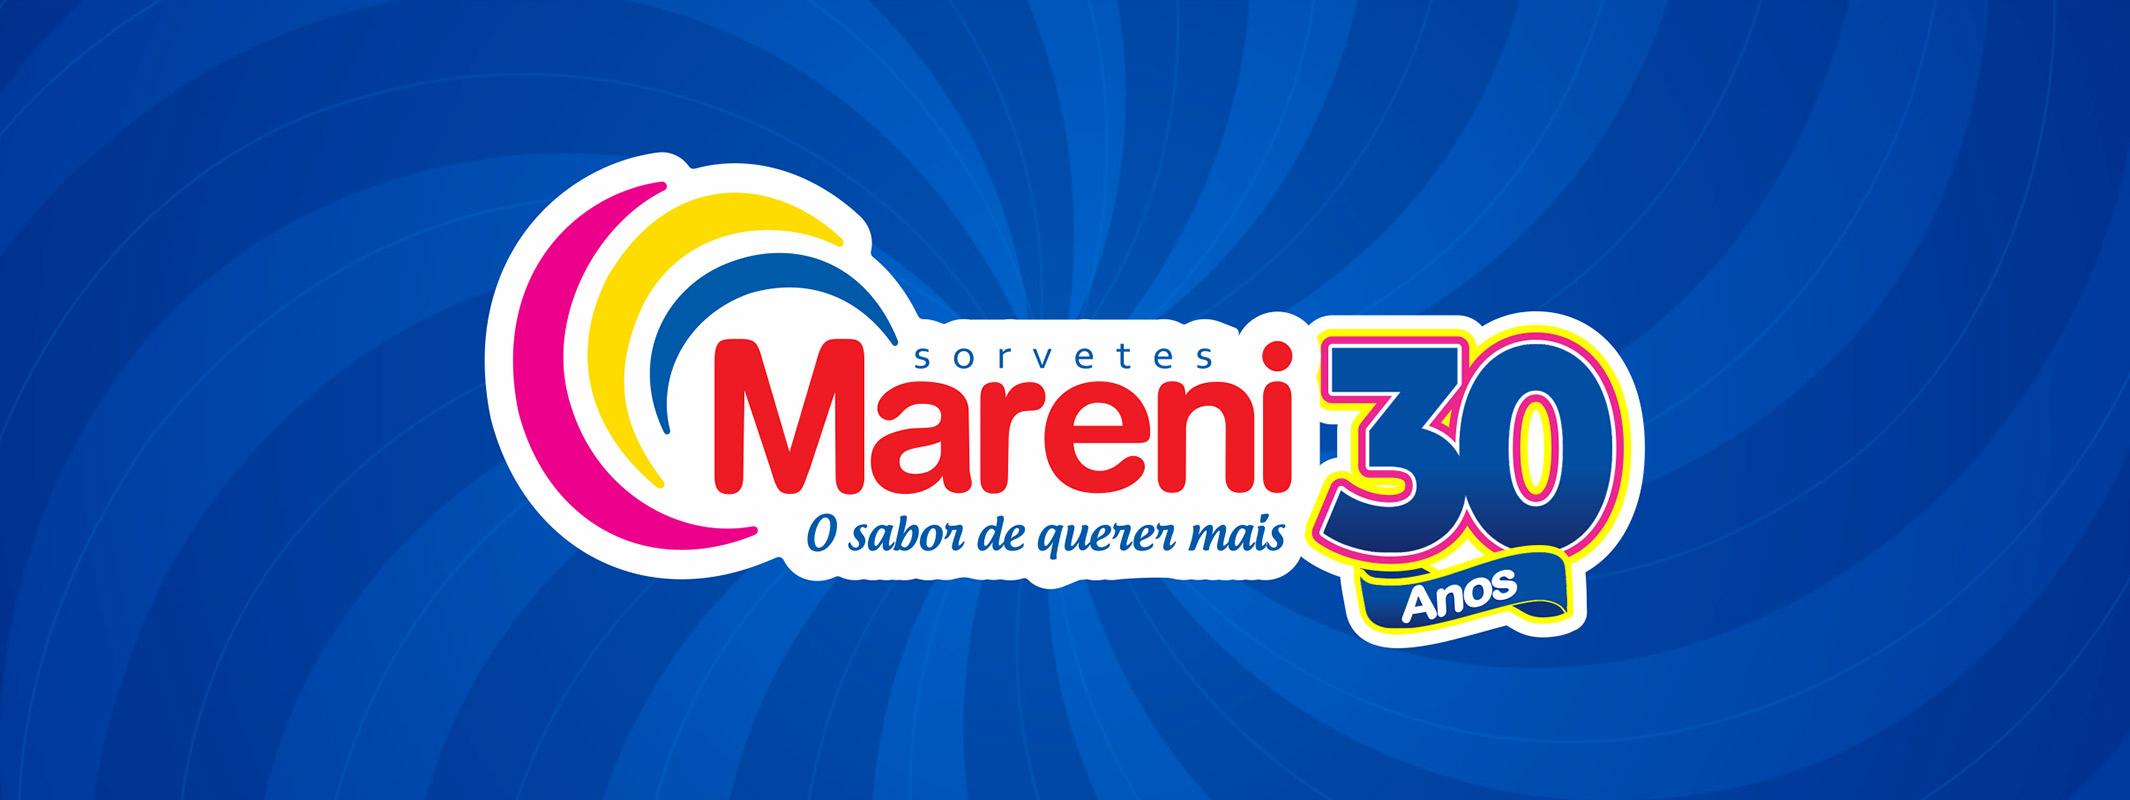 sorvetes-mareni-30-anos